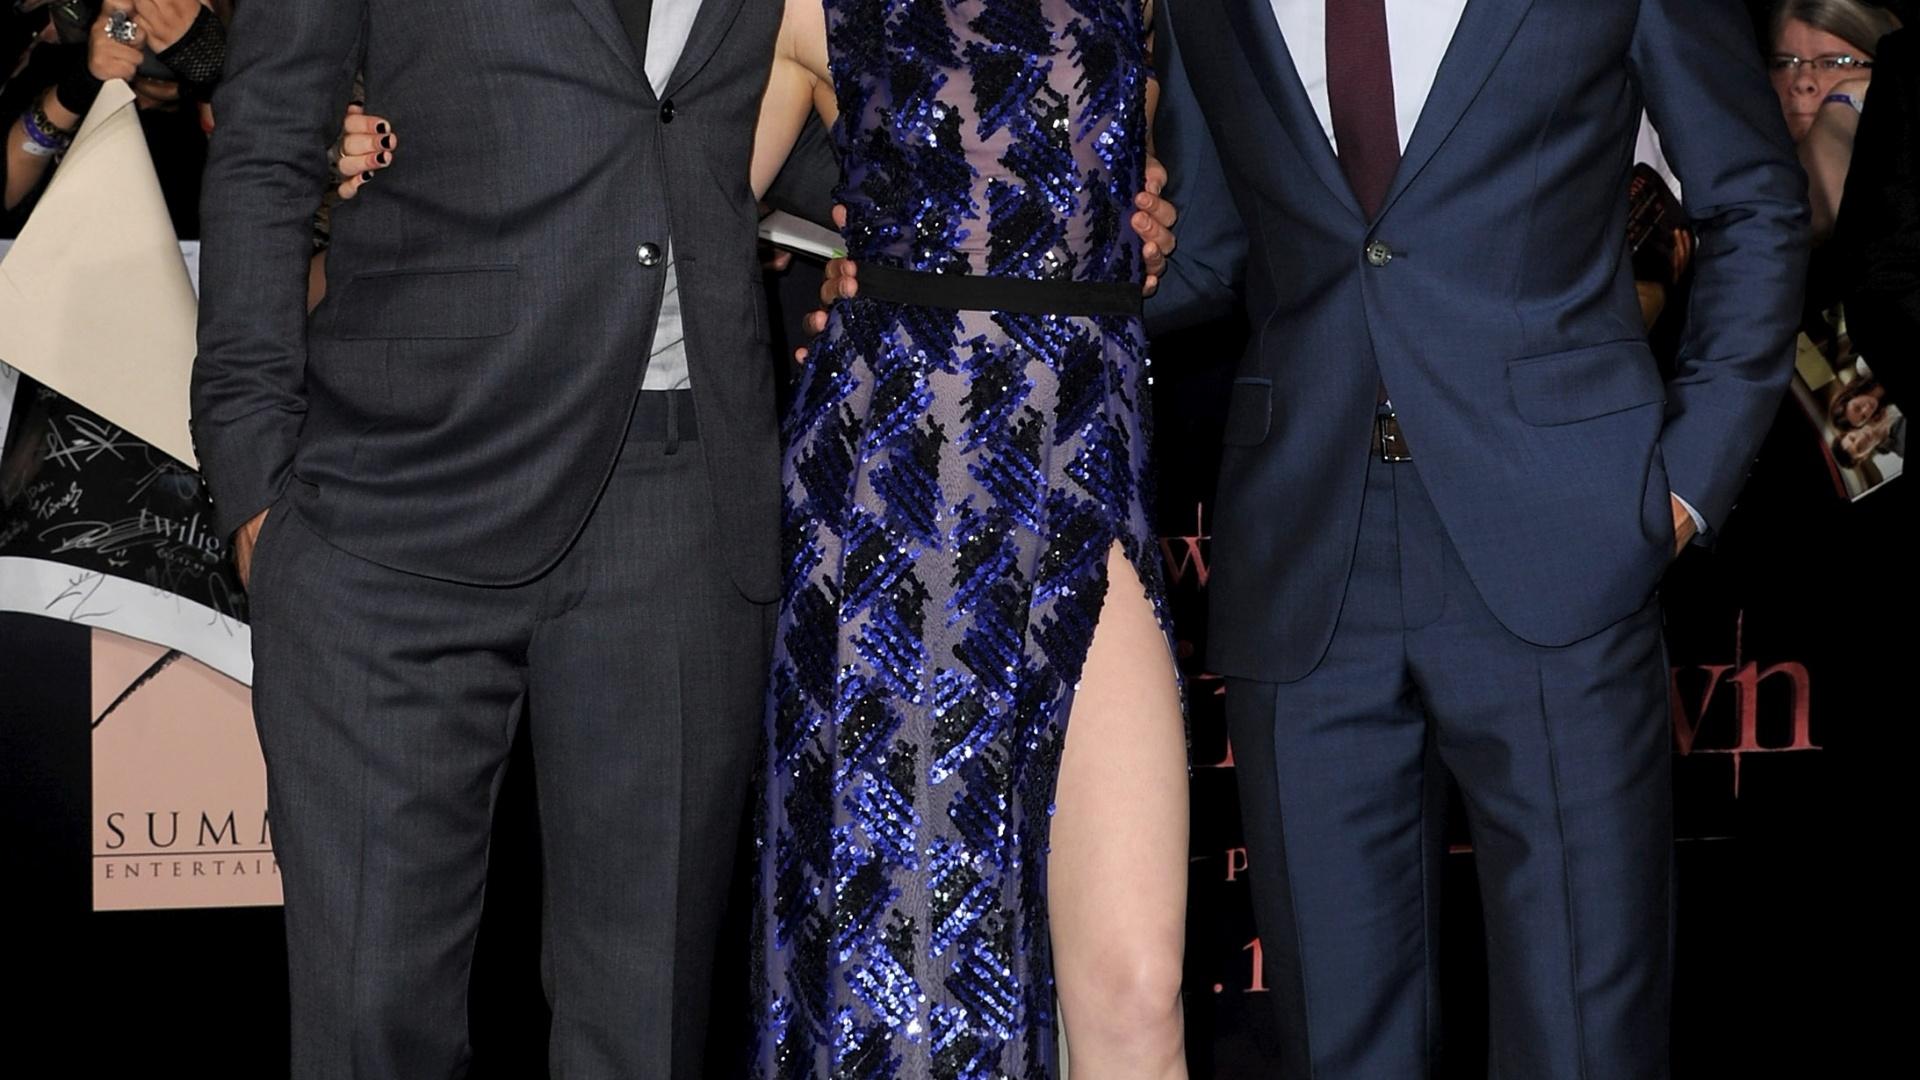 Robert Pattinson, Kristen stewart e Taylor Lautner na pré-estreia de